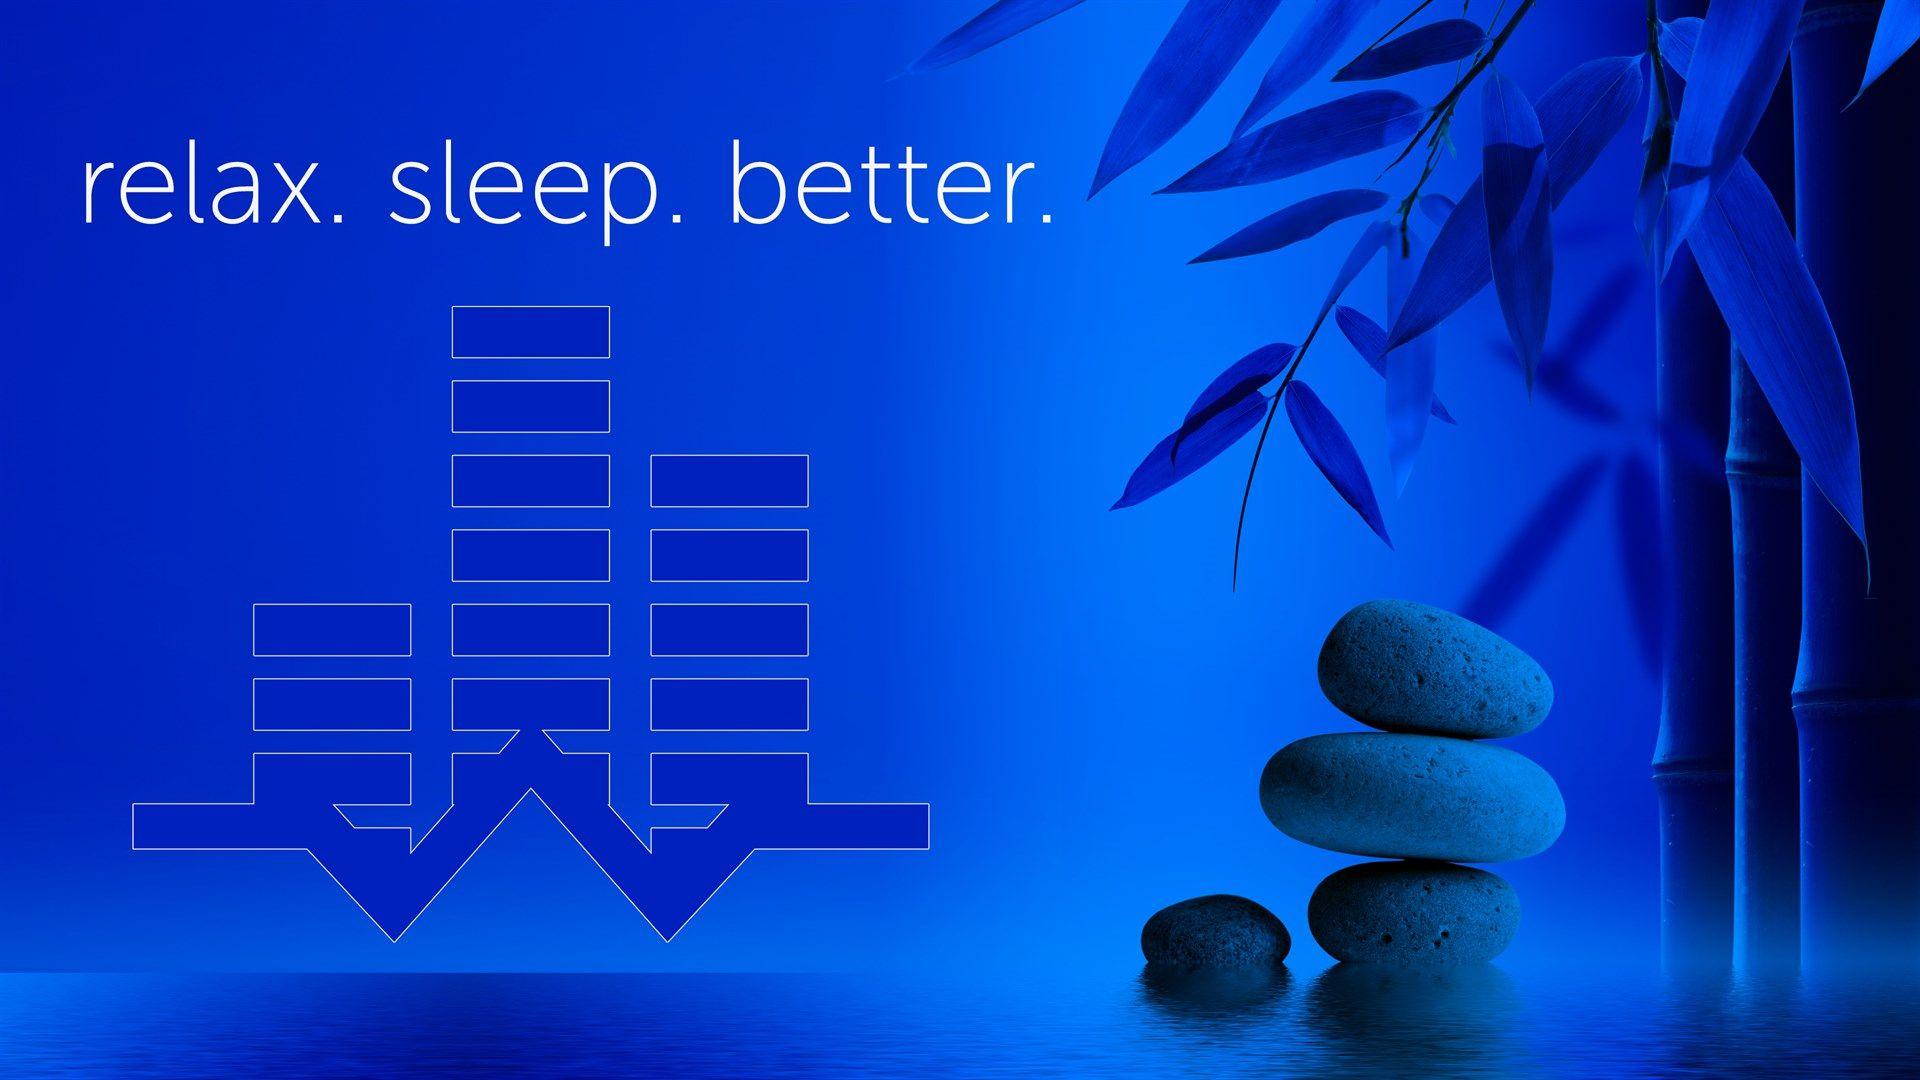 White Noise sleep app on Windows 10